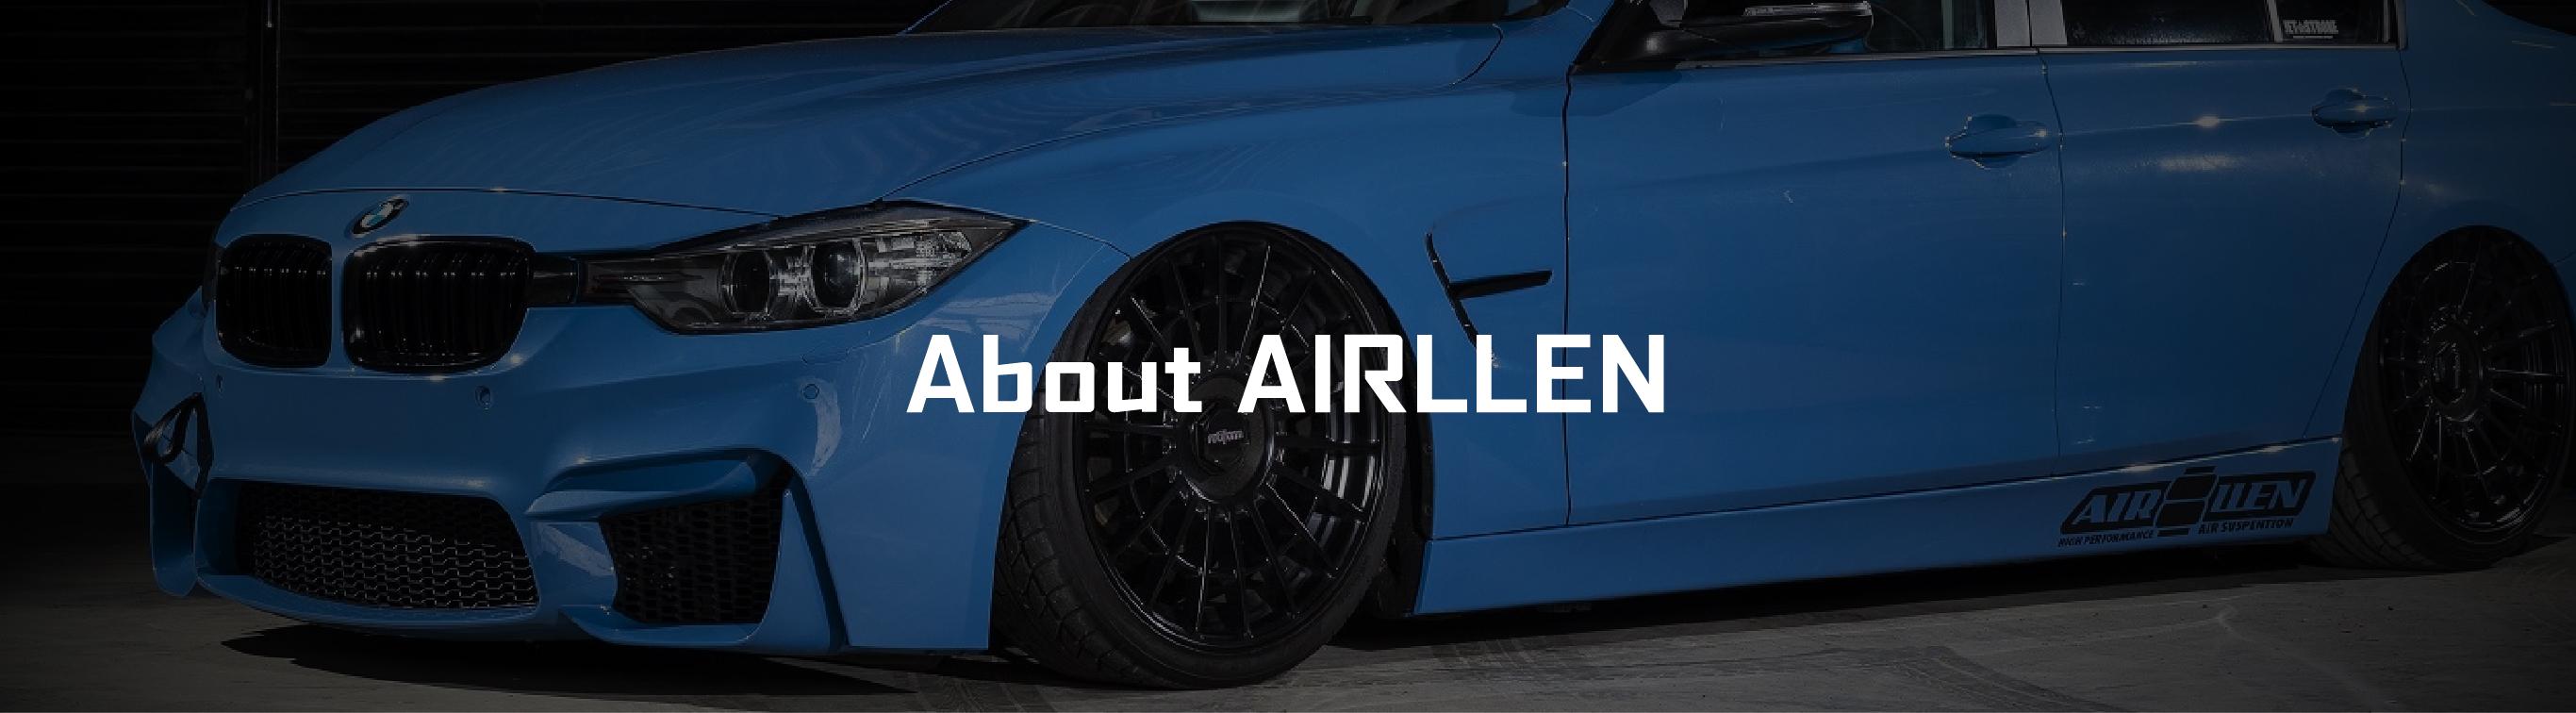 About AIRLLEN